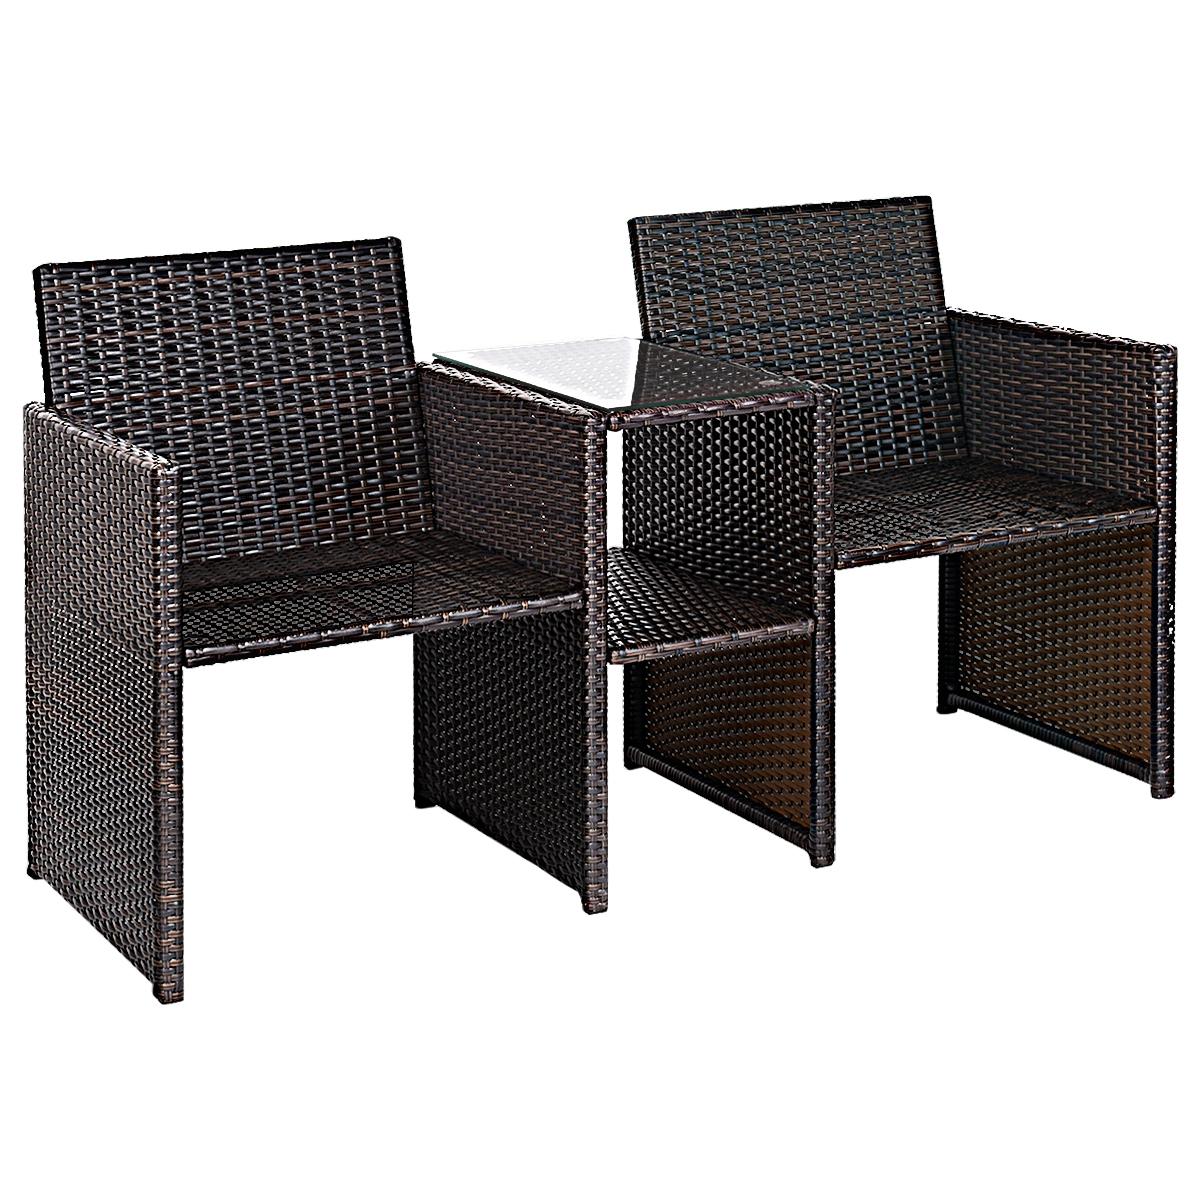 Patio Rattan Conversation Cushioned Seat Sofa Set